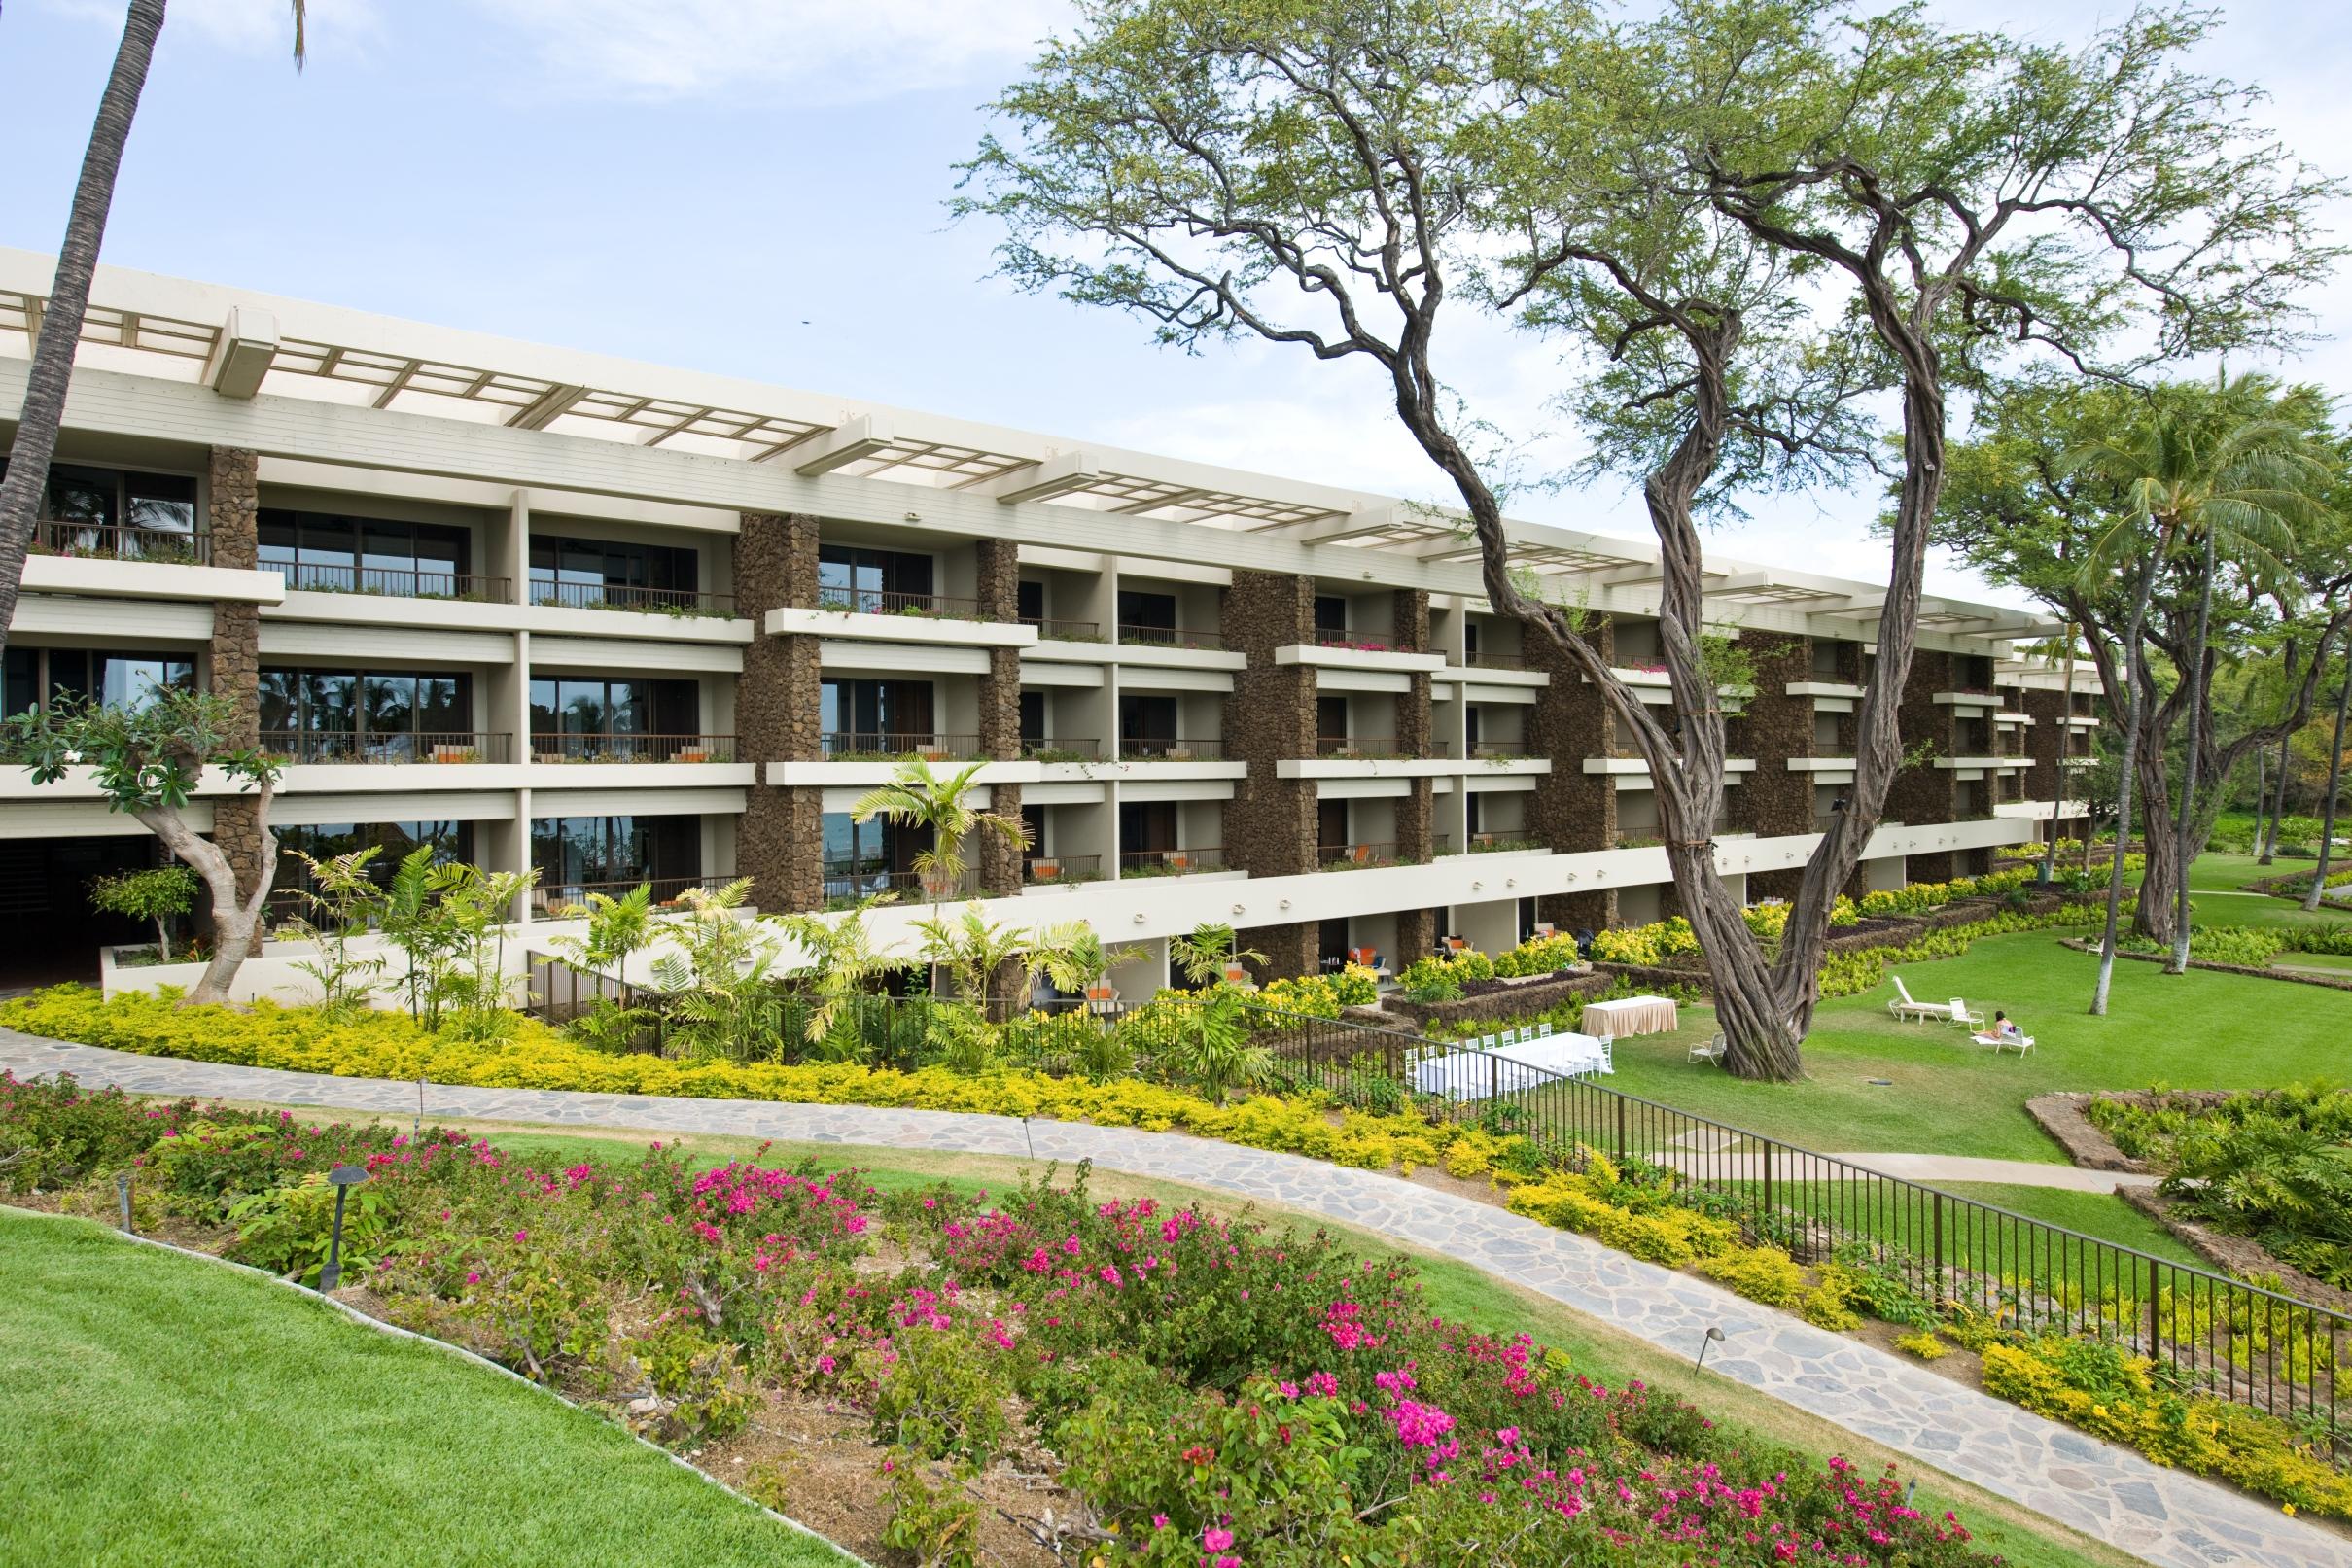 Mauna kea beach hotel renovation hdcc for Hotel design kea